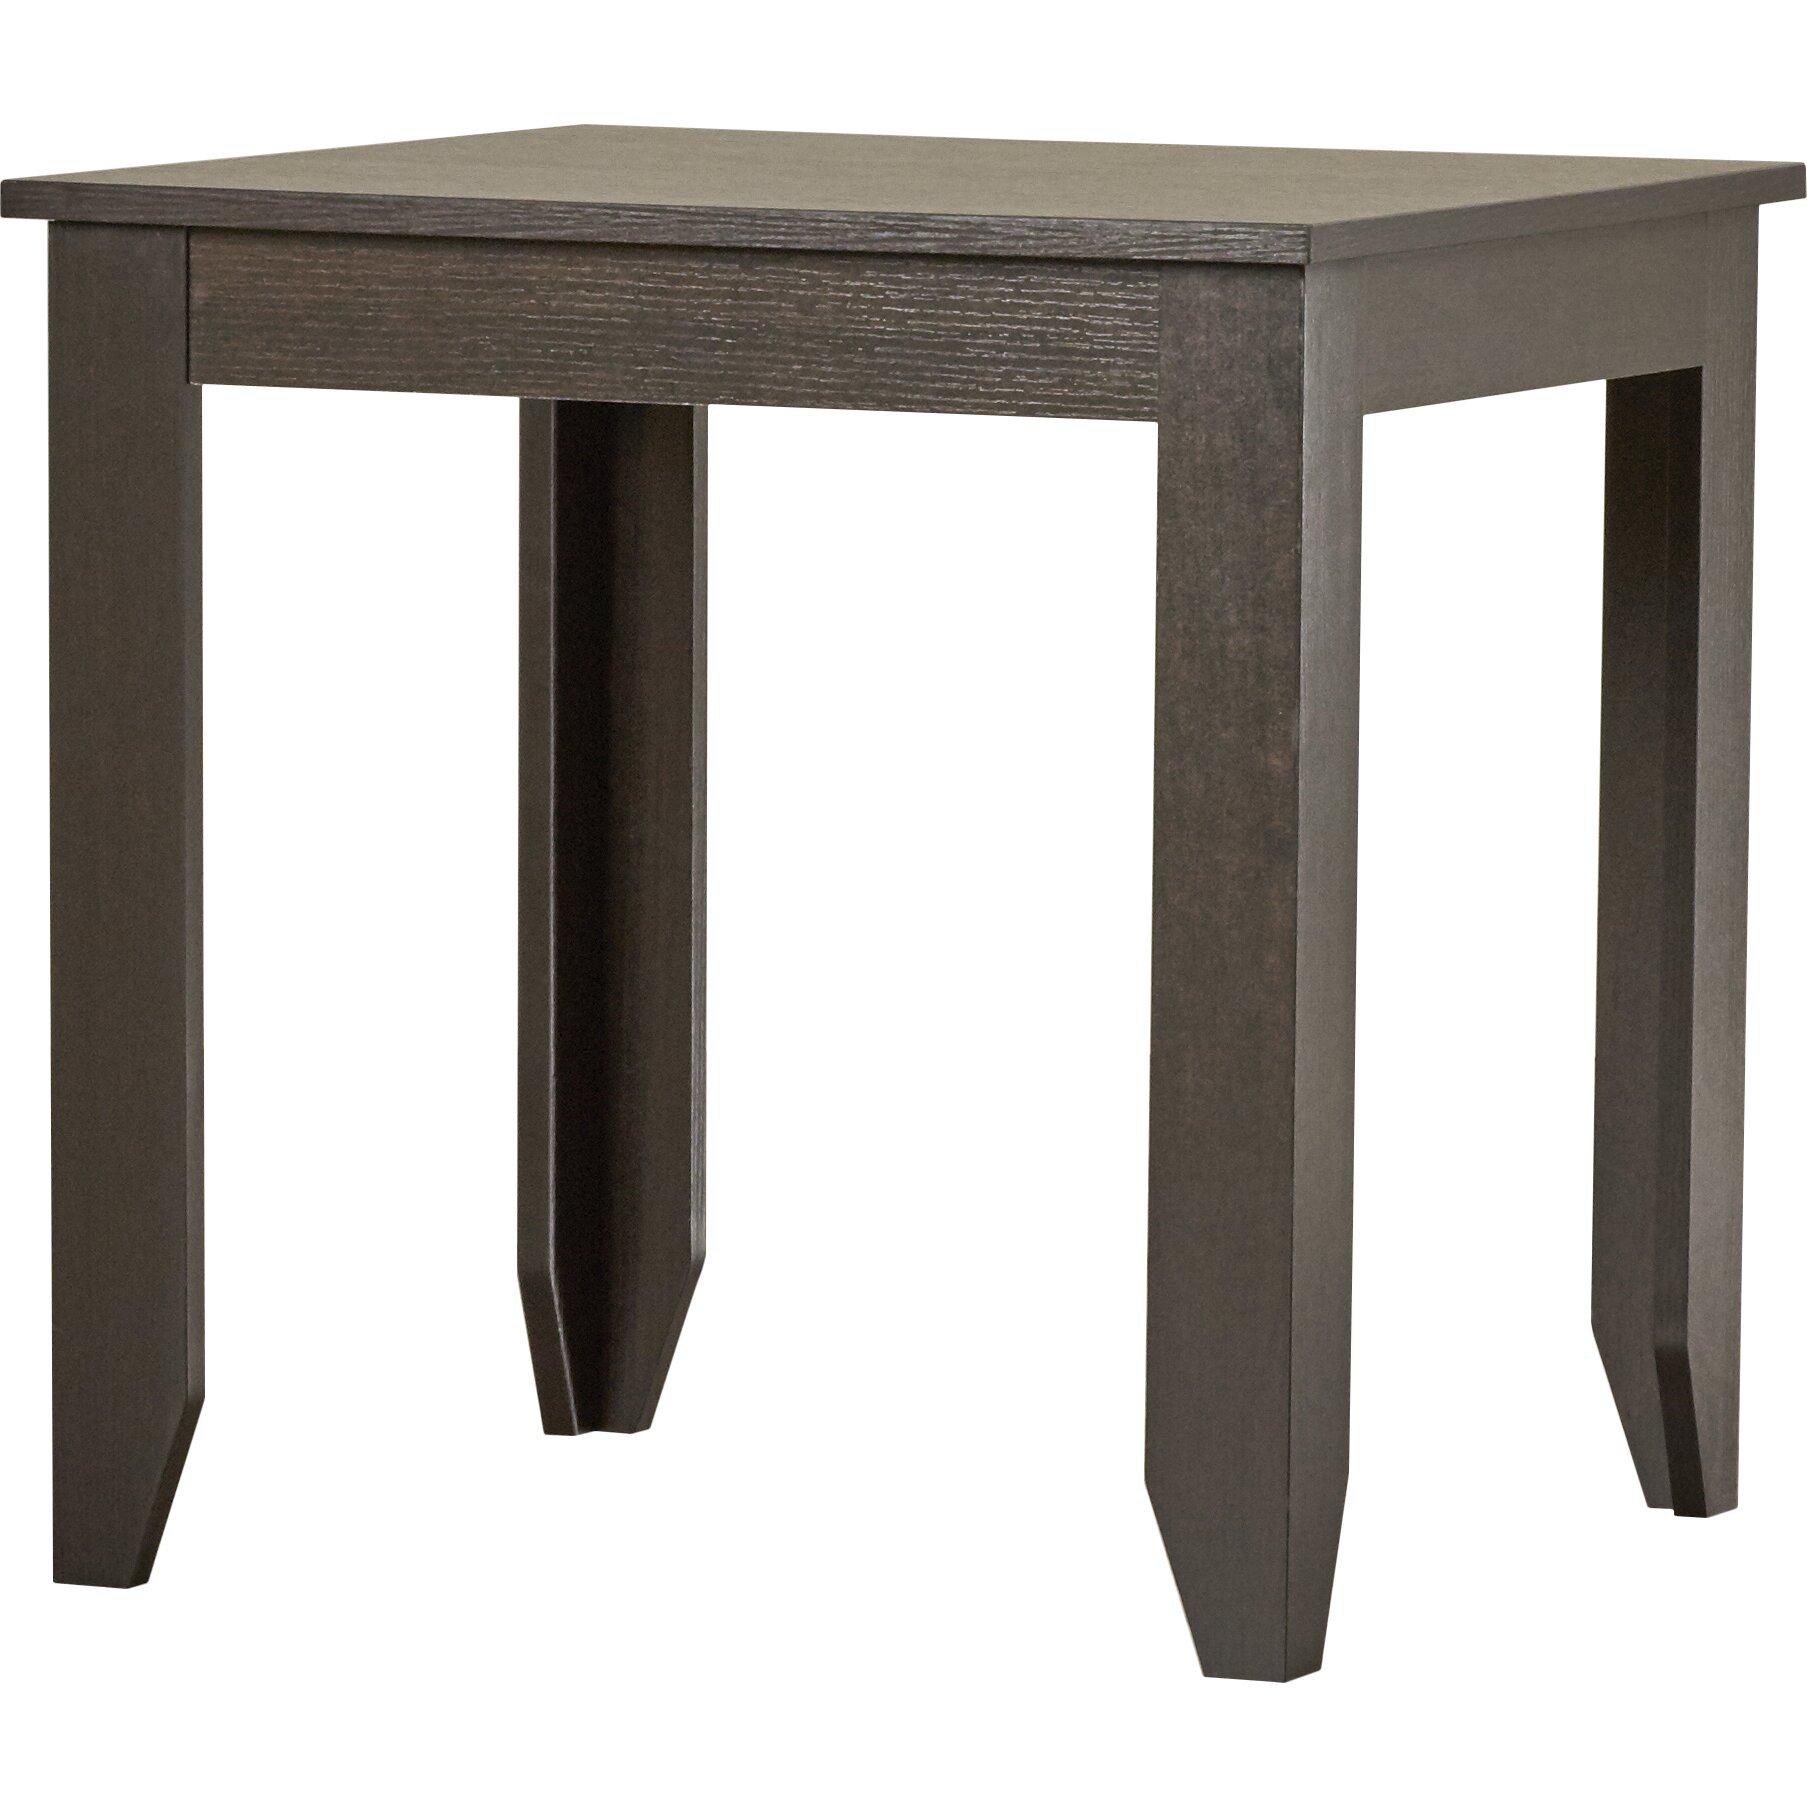 Folding Banquet Tables For Sale Images